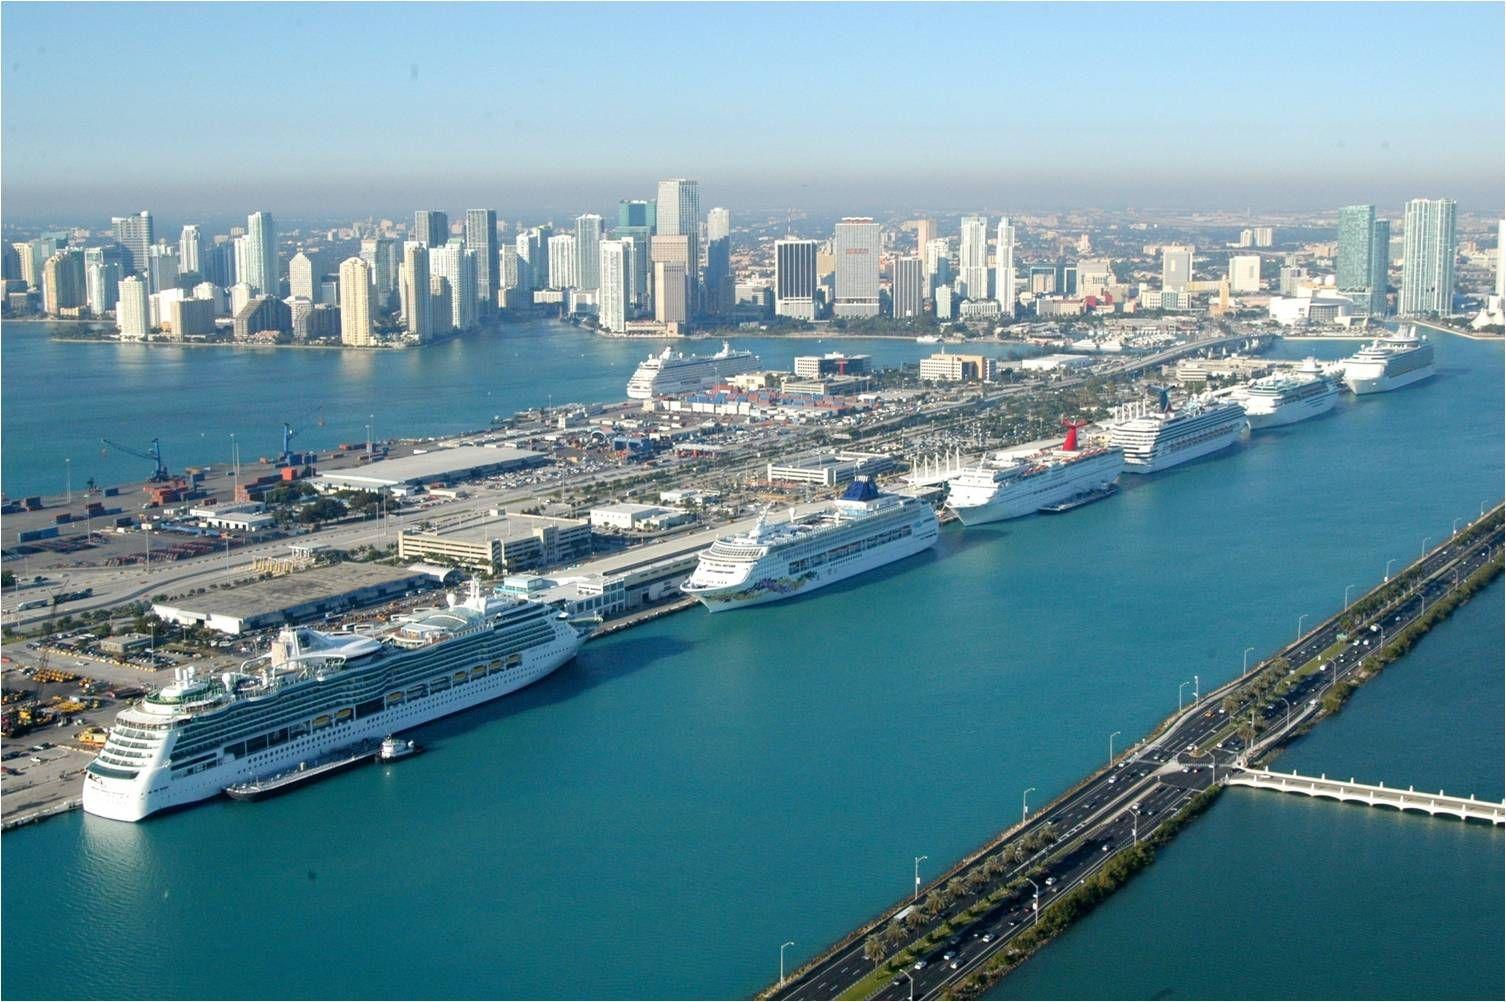 Cruise Ship Crew Spending Benefits Local Businesses Port News Cruise News Cruise Ship Industry News Community World Cruise Cruise Holidays Cruise Port